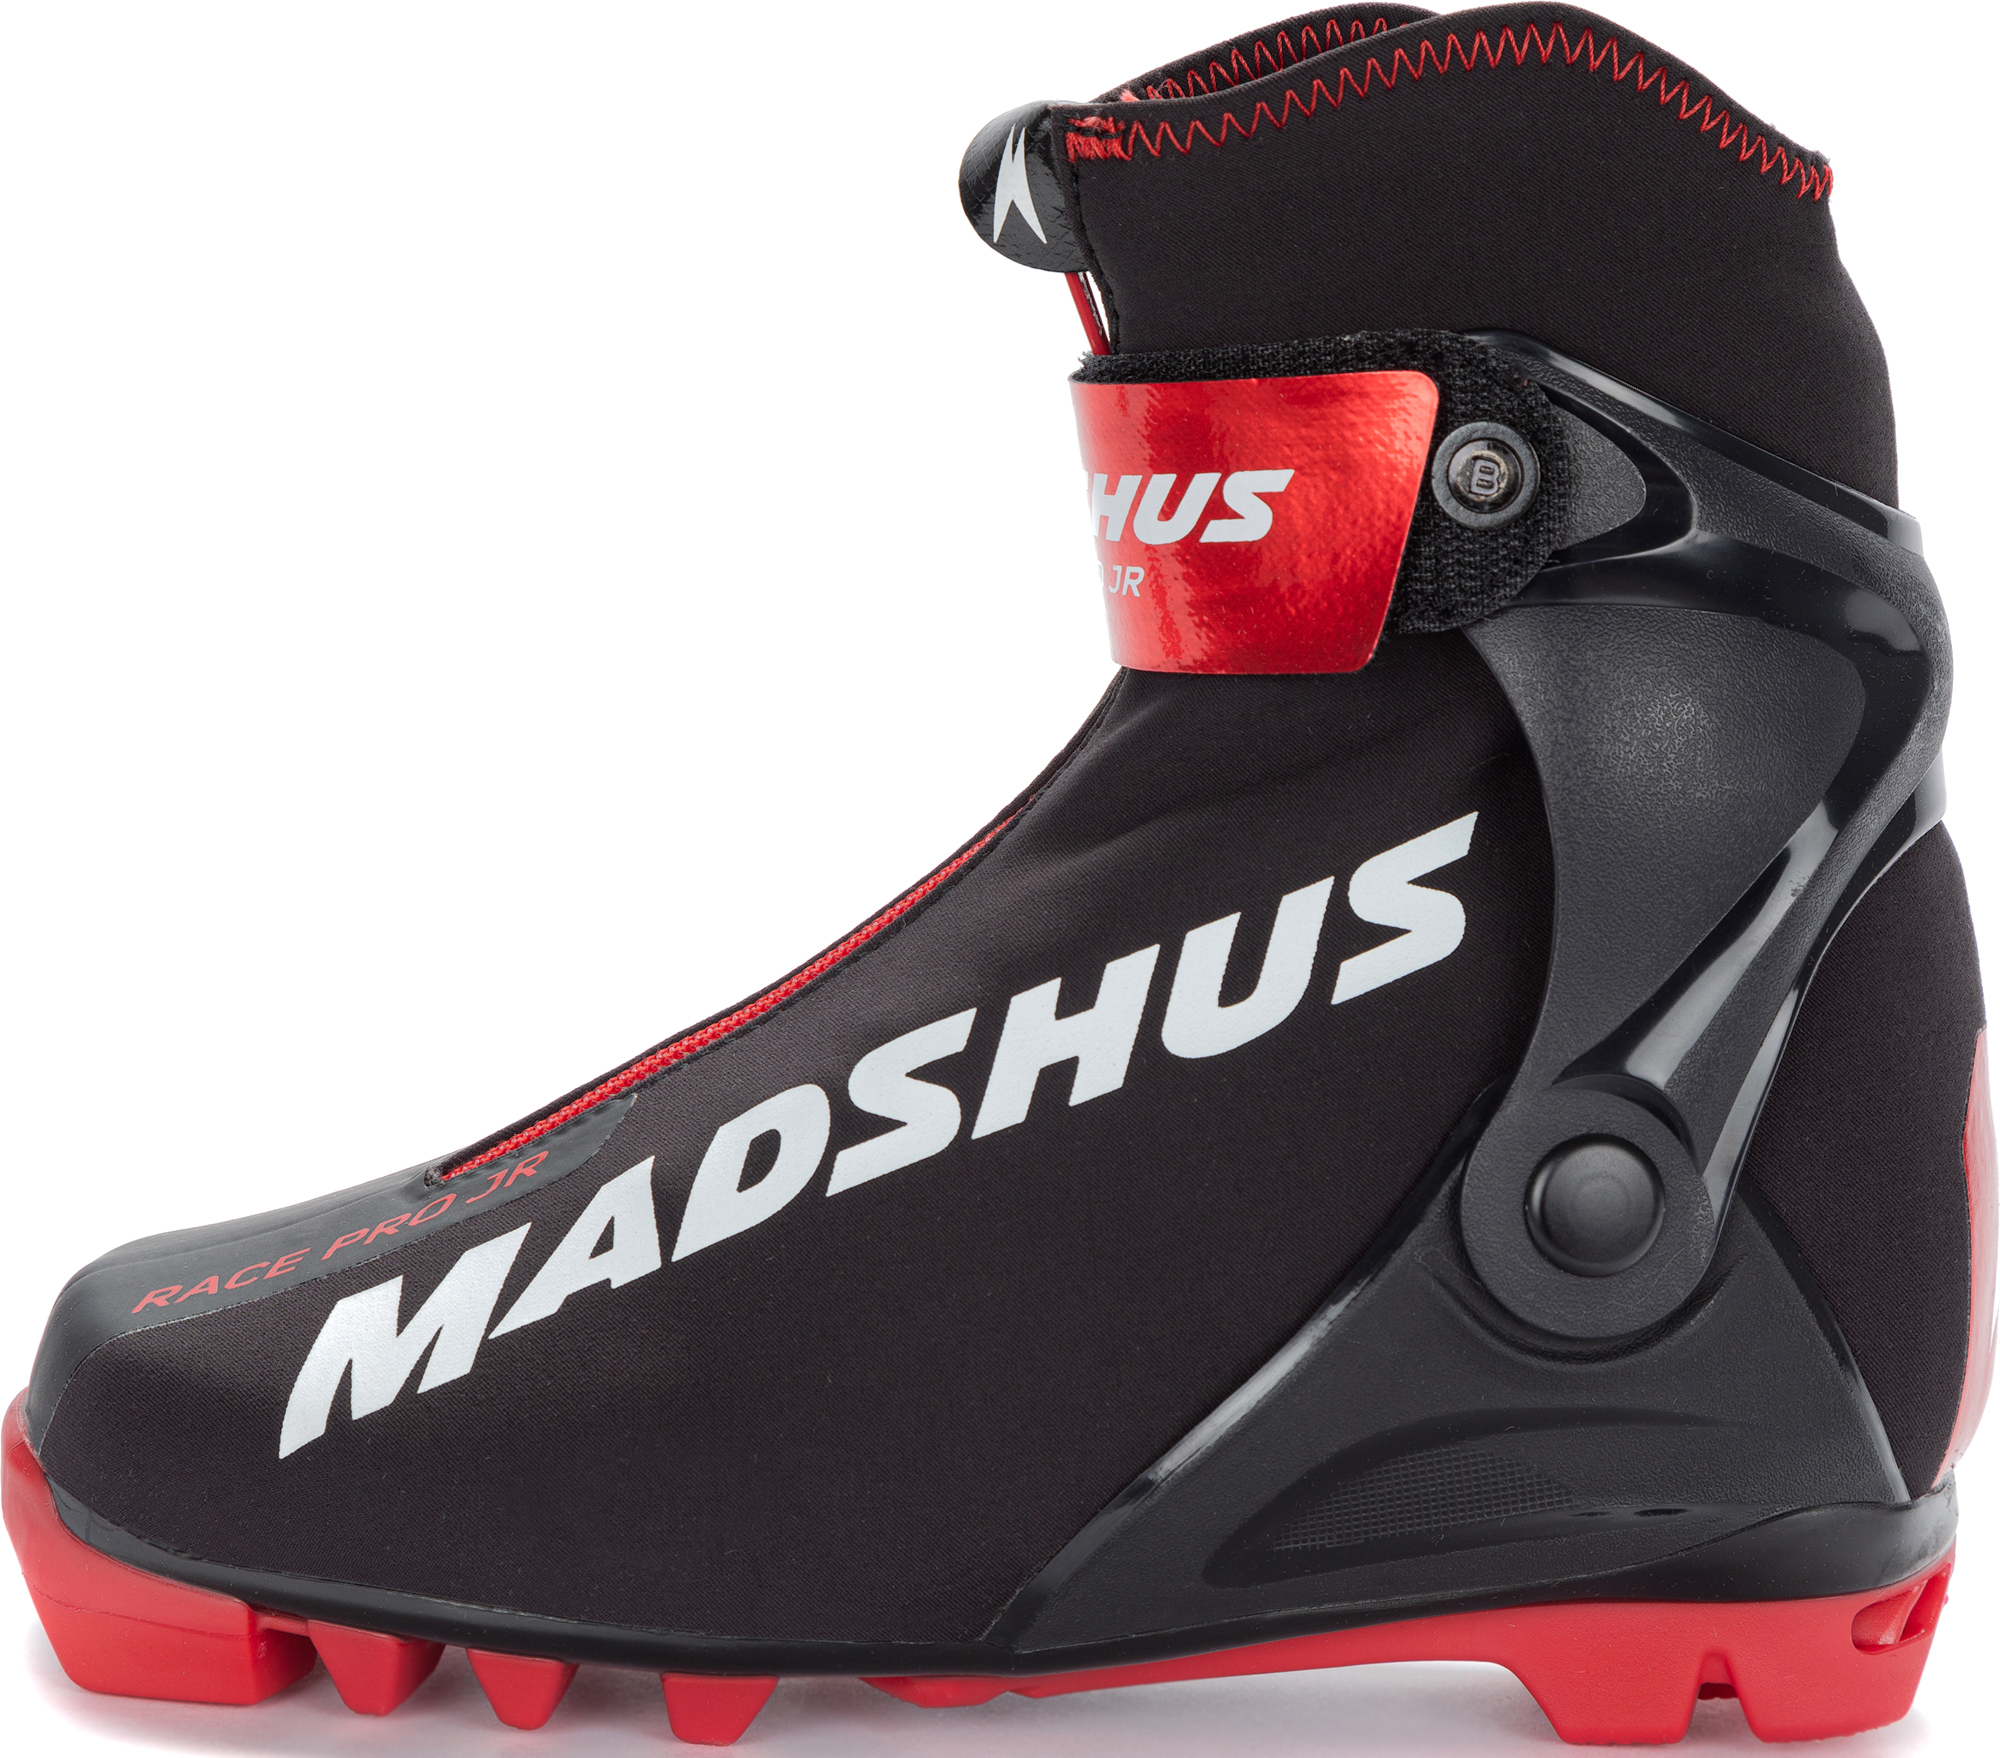 Madshus RACE PRO JR Kids cross-country ski boots